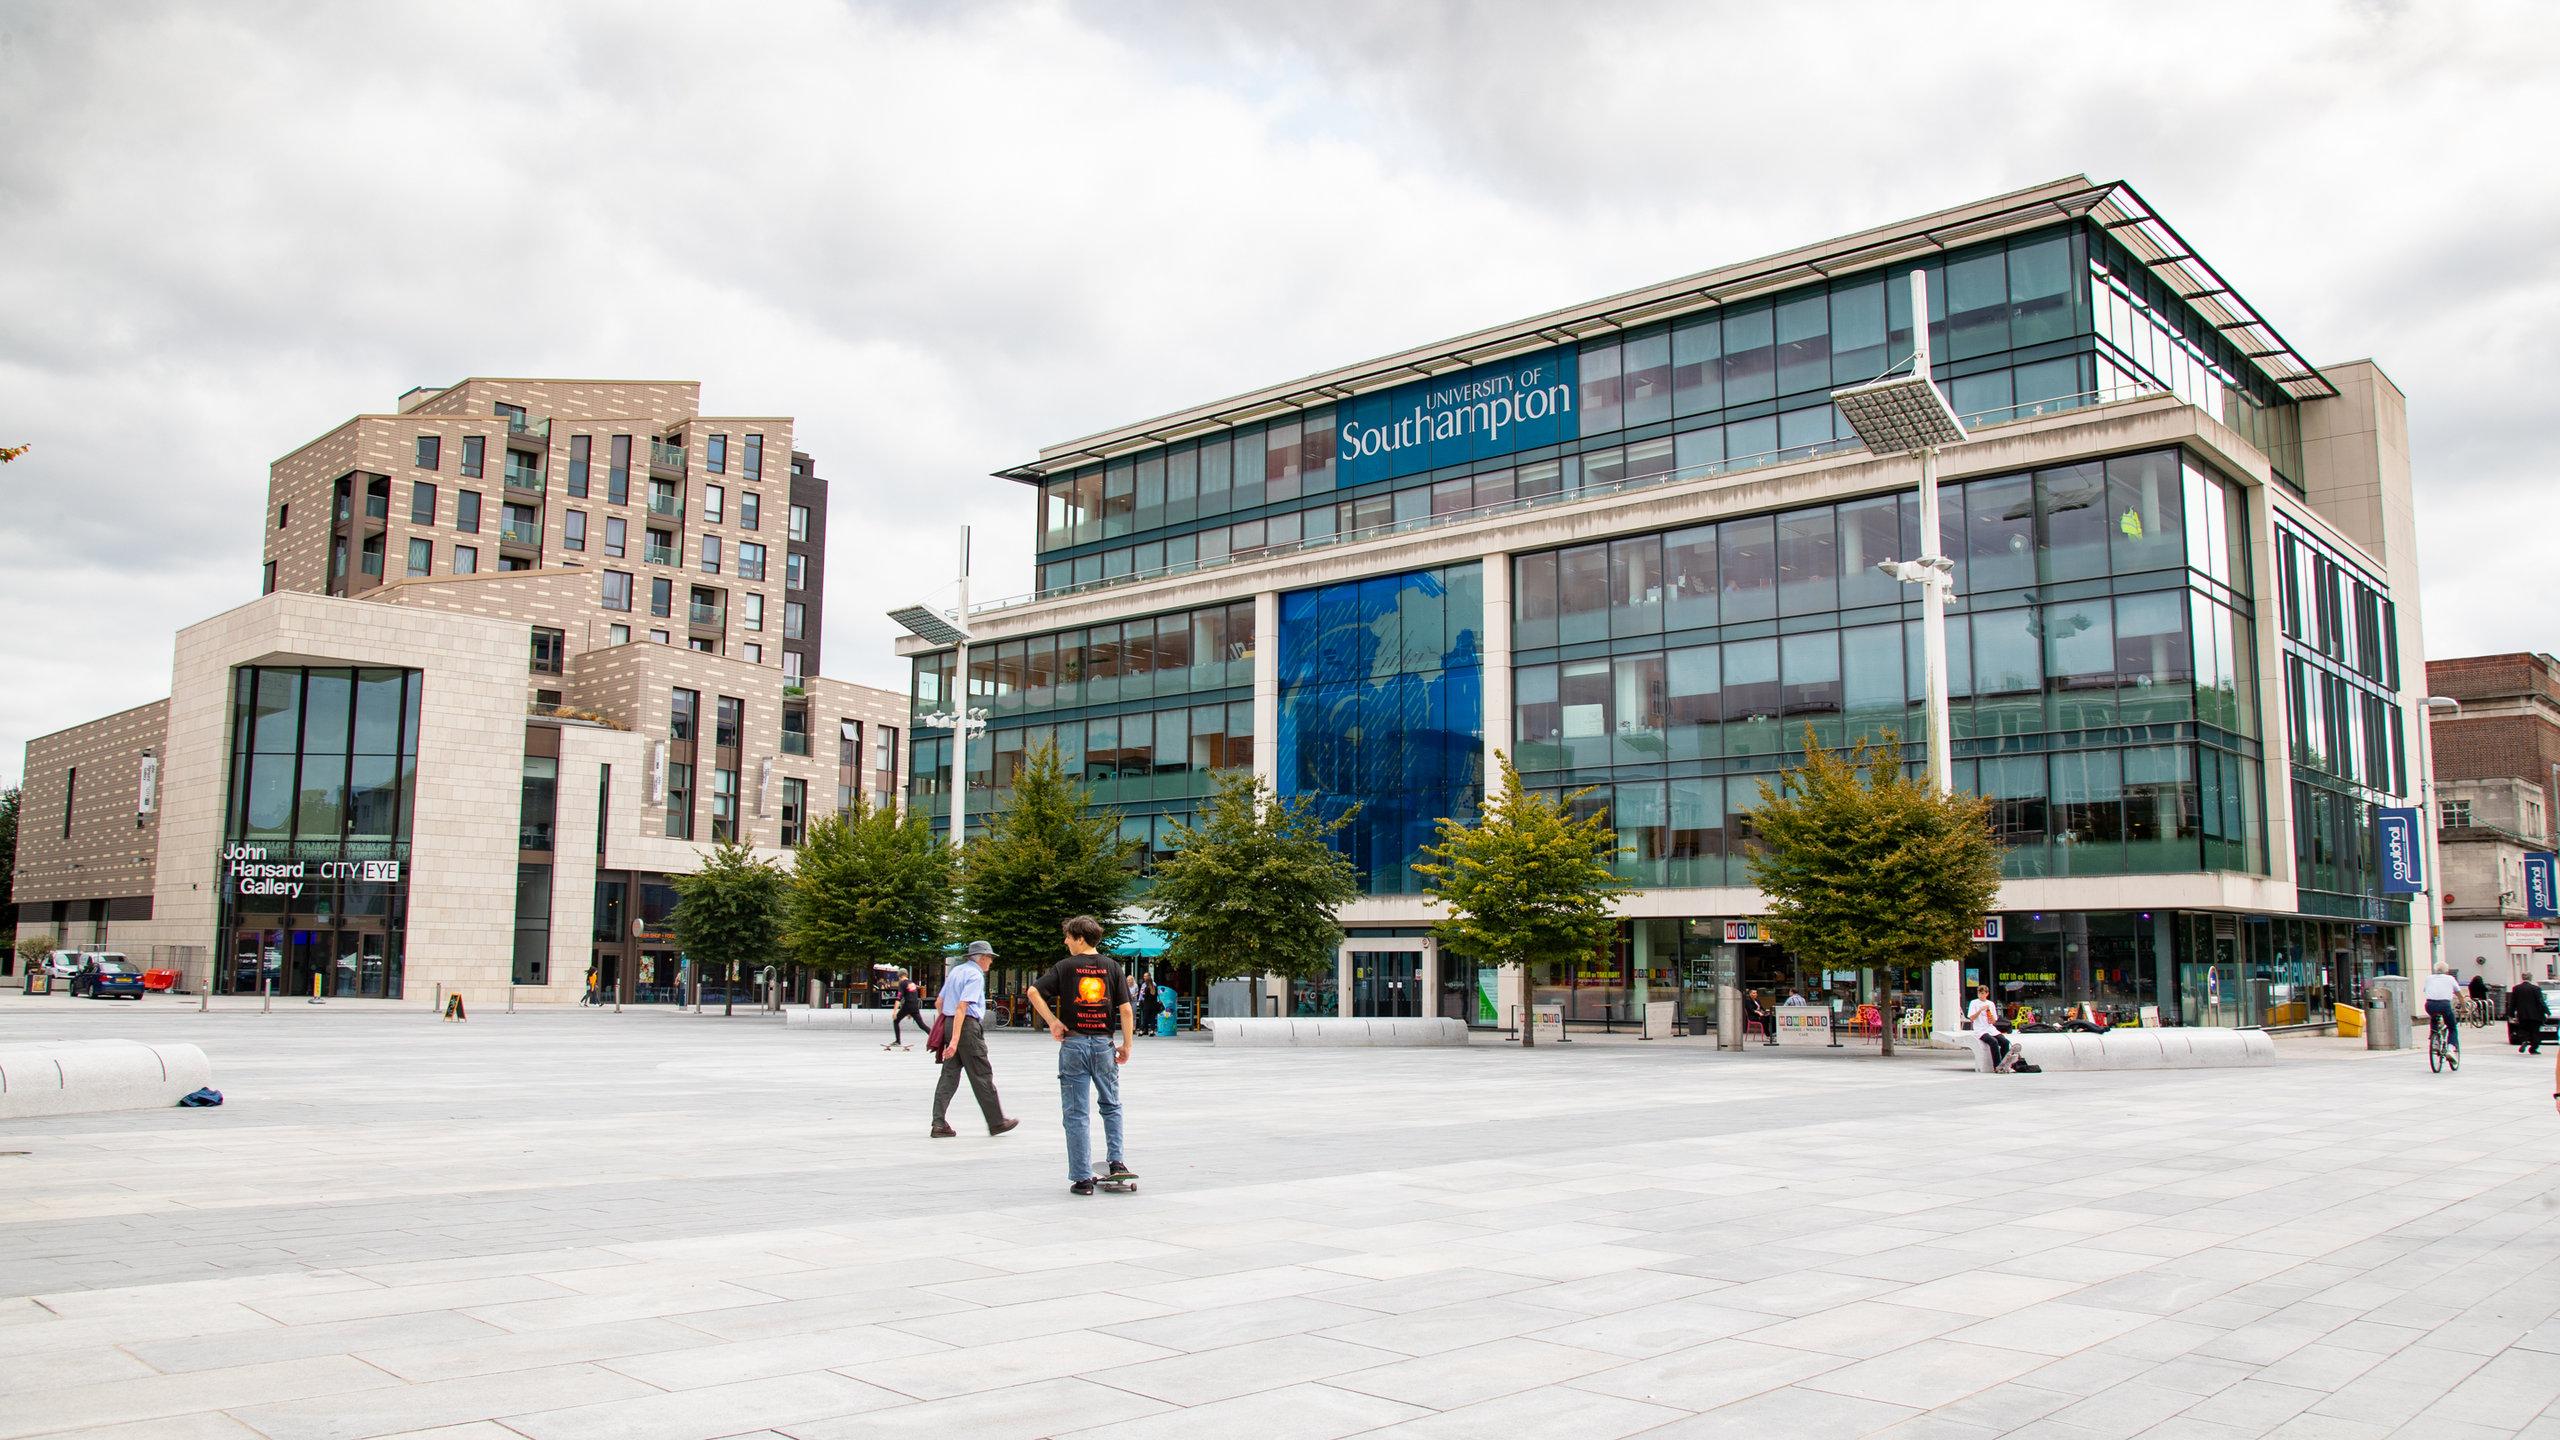 Southampton Solent University, Southampton, England, United Kingdom